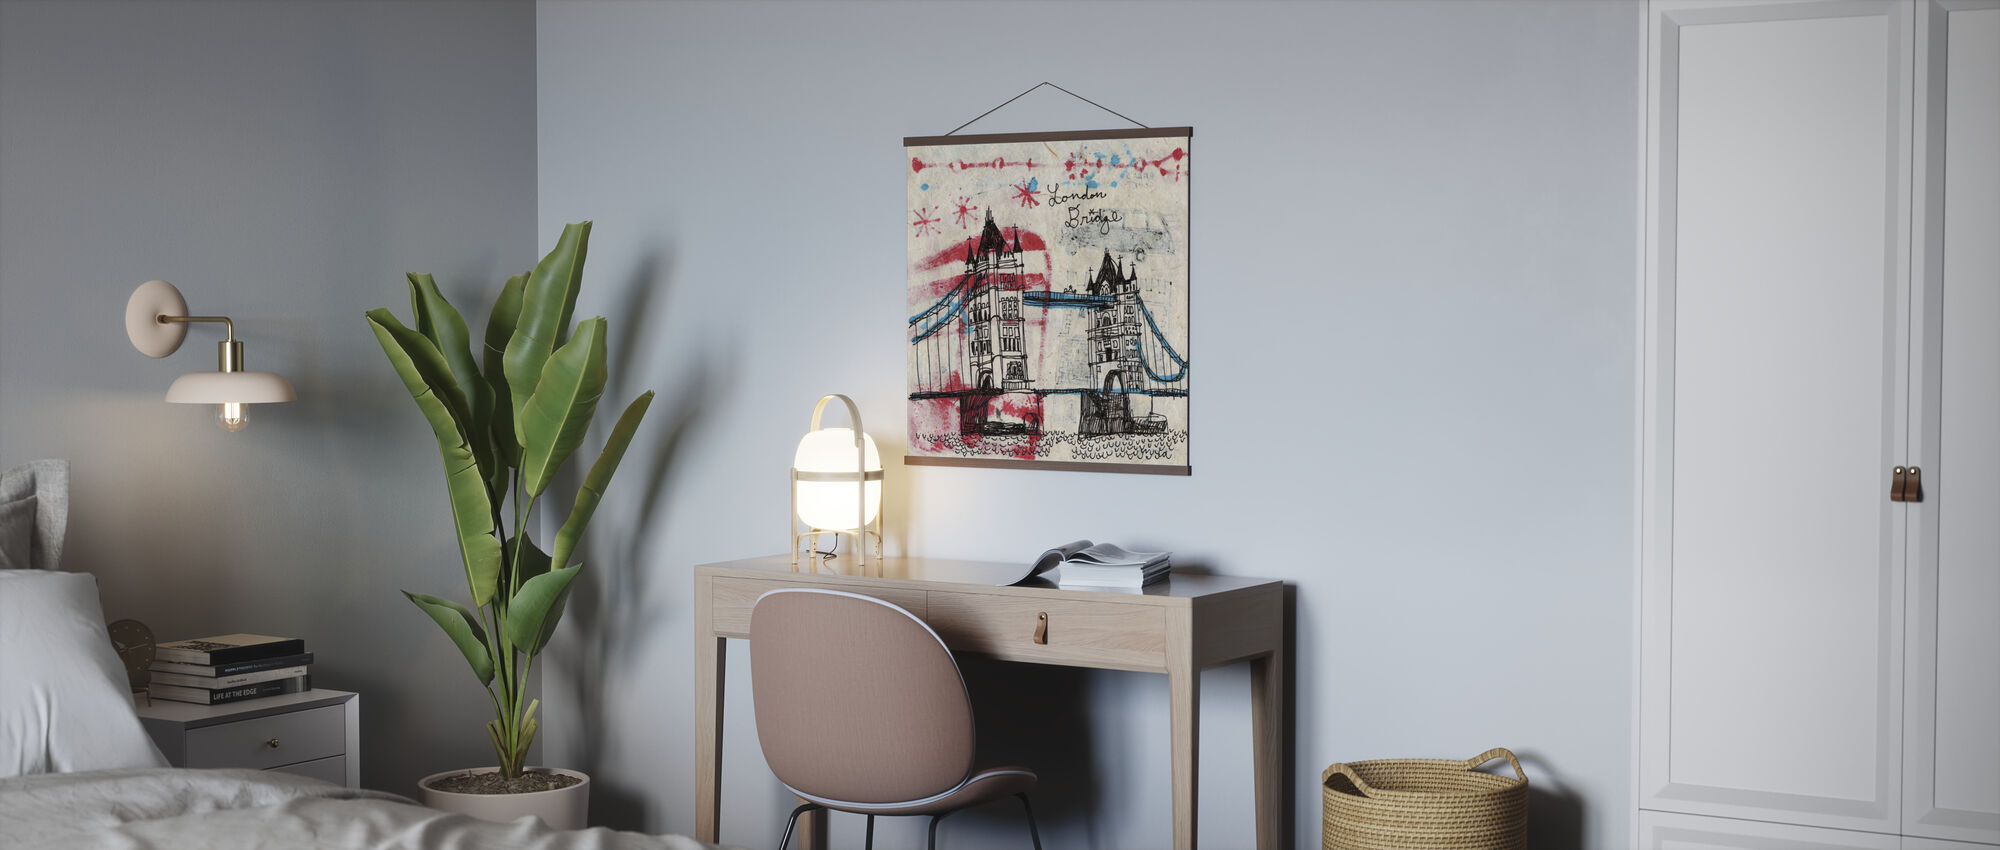 Tower Bridge - Poster - Office